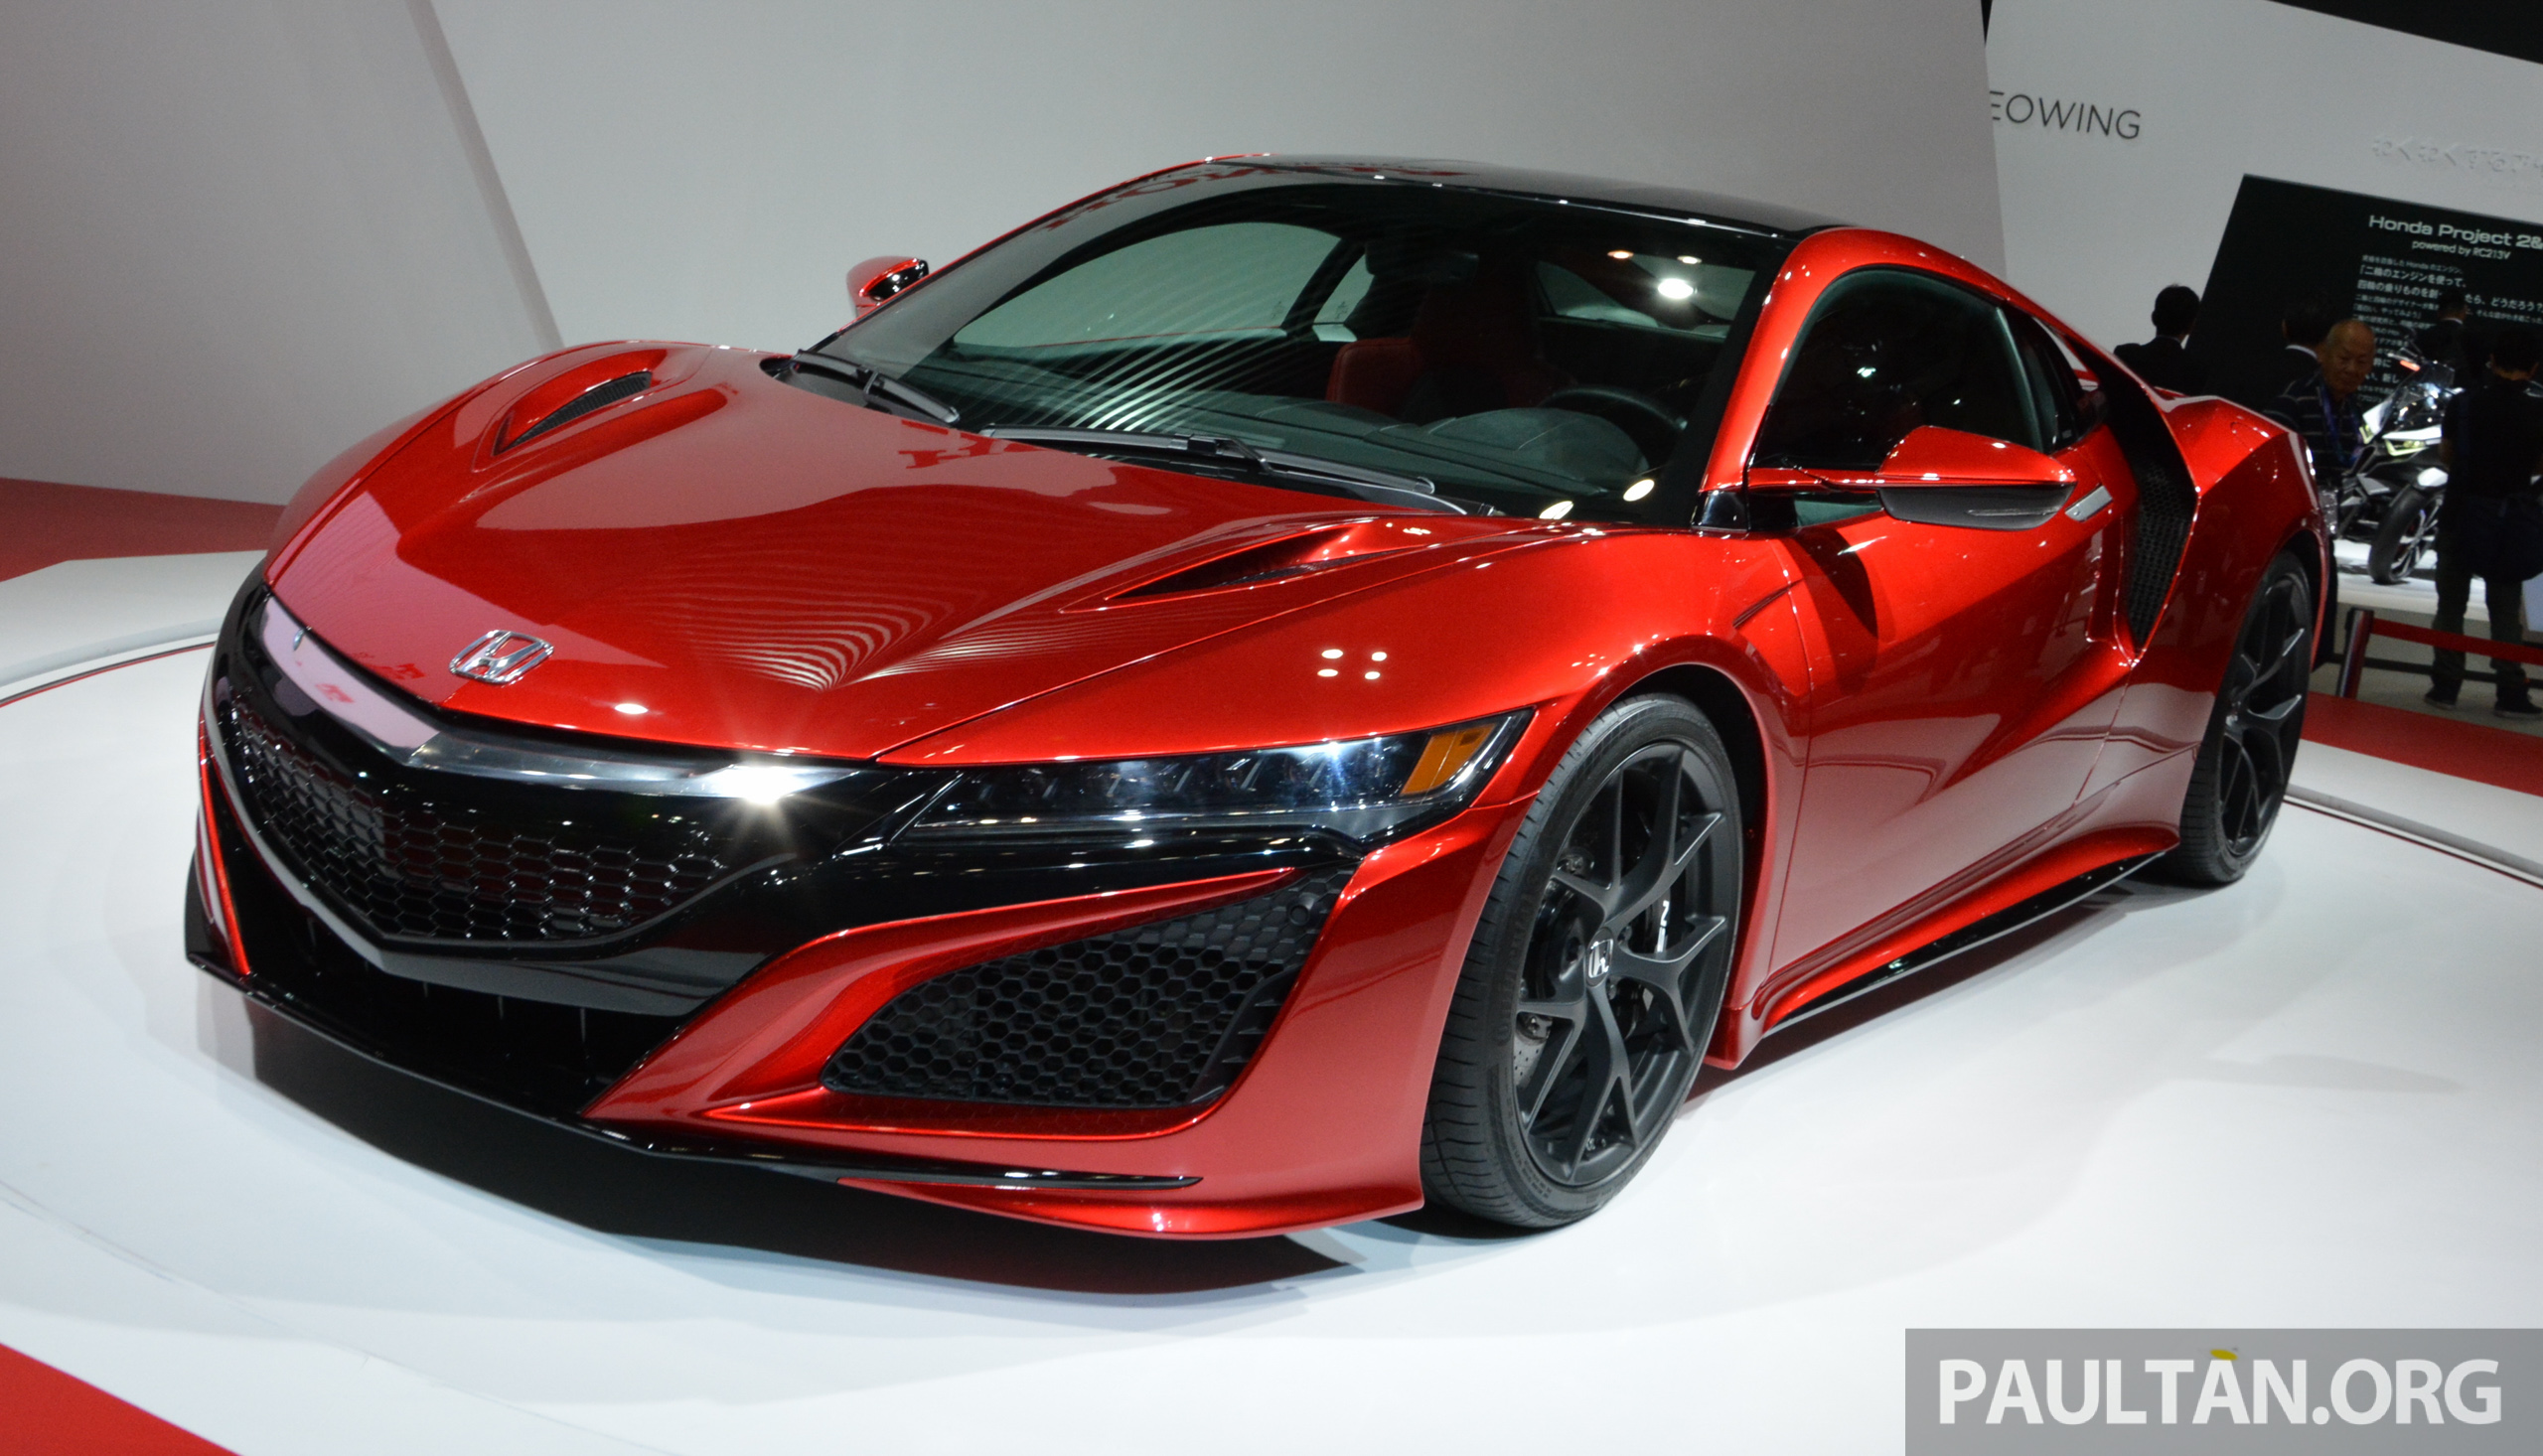 2015 Acura Nsx Price | Autos Post Honda Nsx 2015 Price